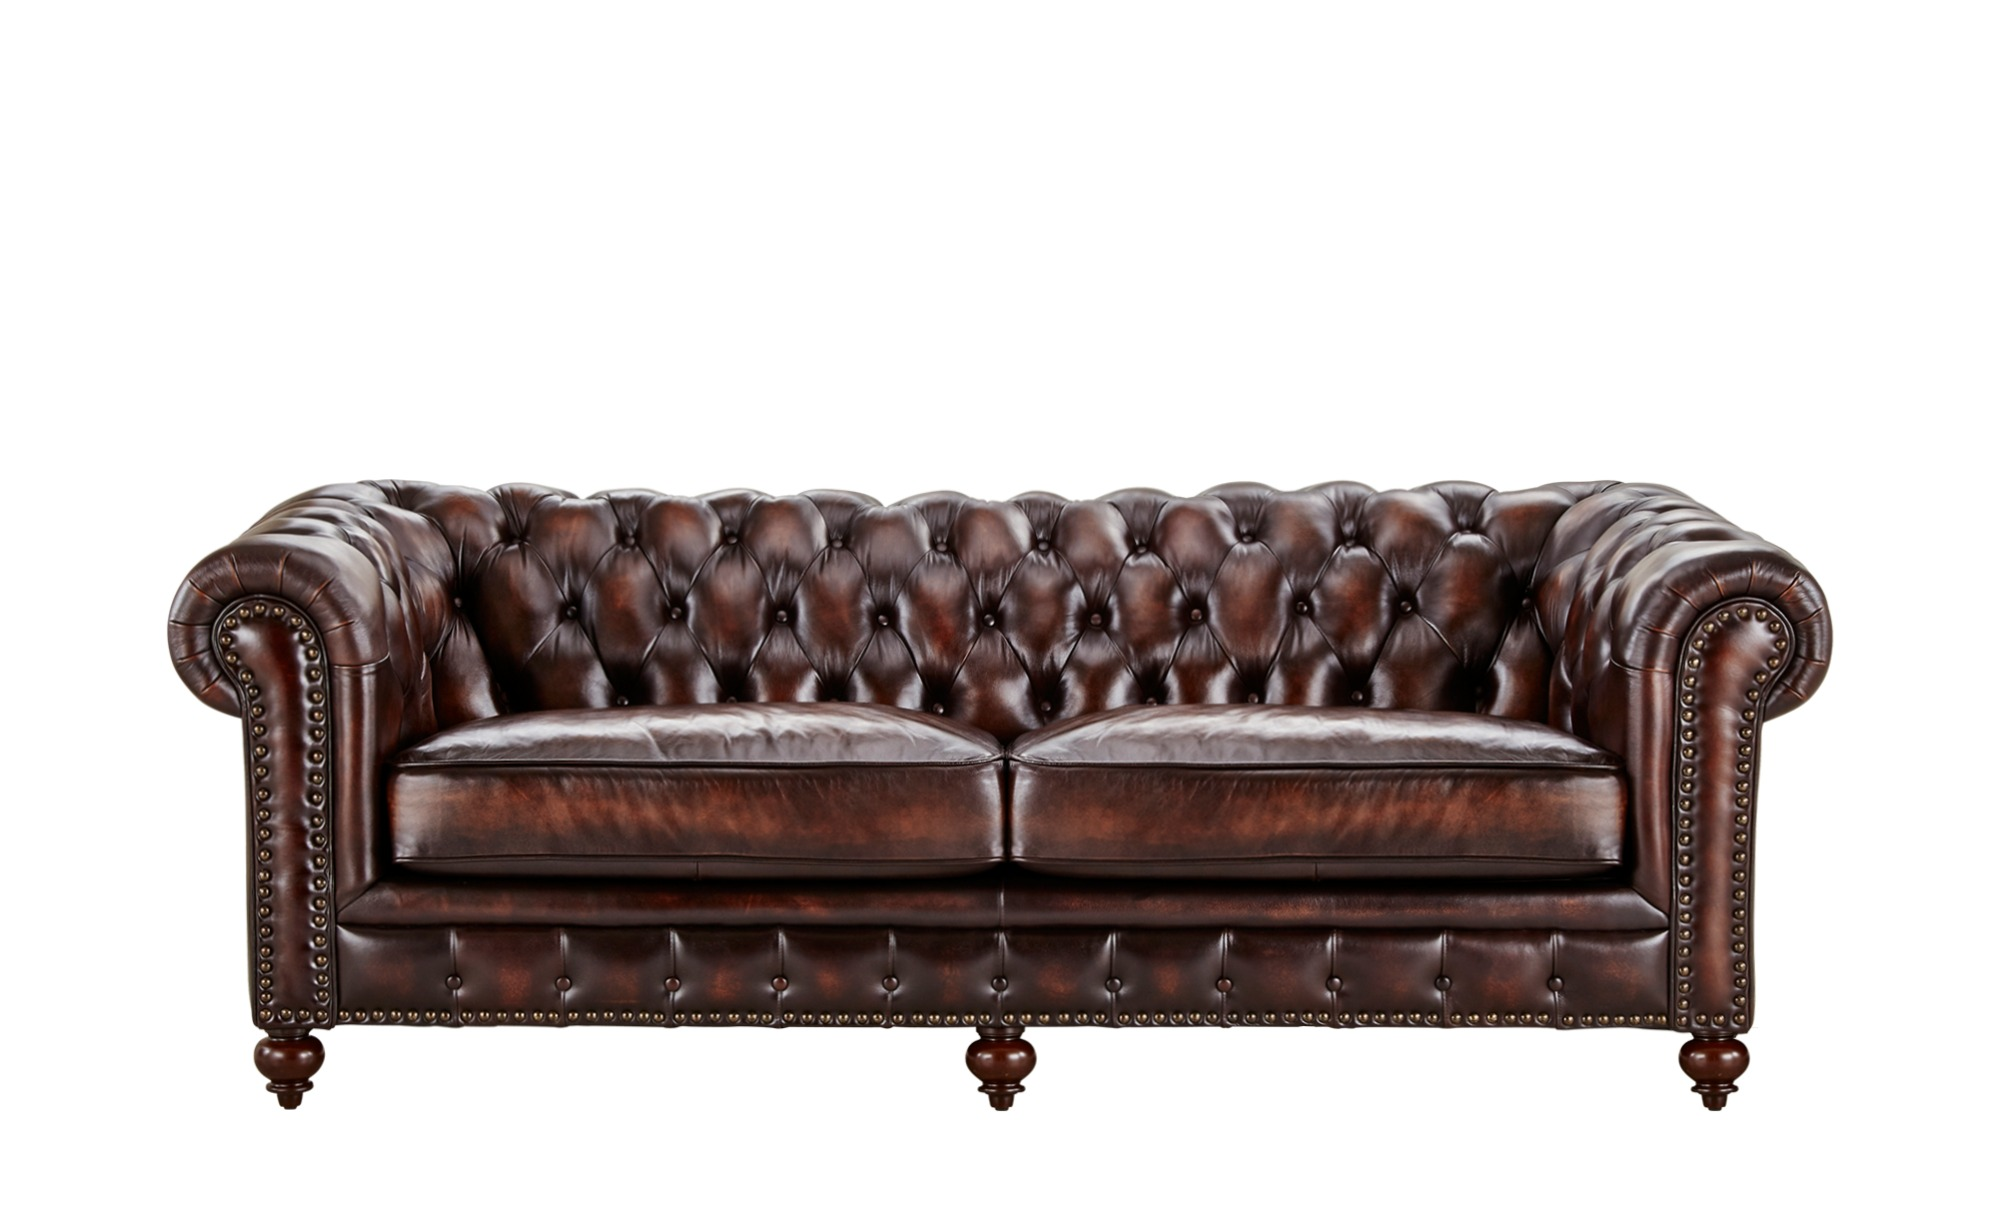 Full Size of Sofa Leder Braun 2 Sitzer   Chesterfield 3 2 1 Set Kaufen Couch Vintage Ikea Gebraucht Ledersofa Design Rustikal Otto 3 Sitzer Uno Sitzig Großes Rattan Garten Sofa Sofa Leder Braun